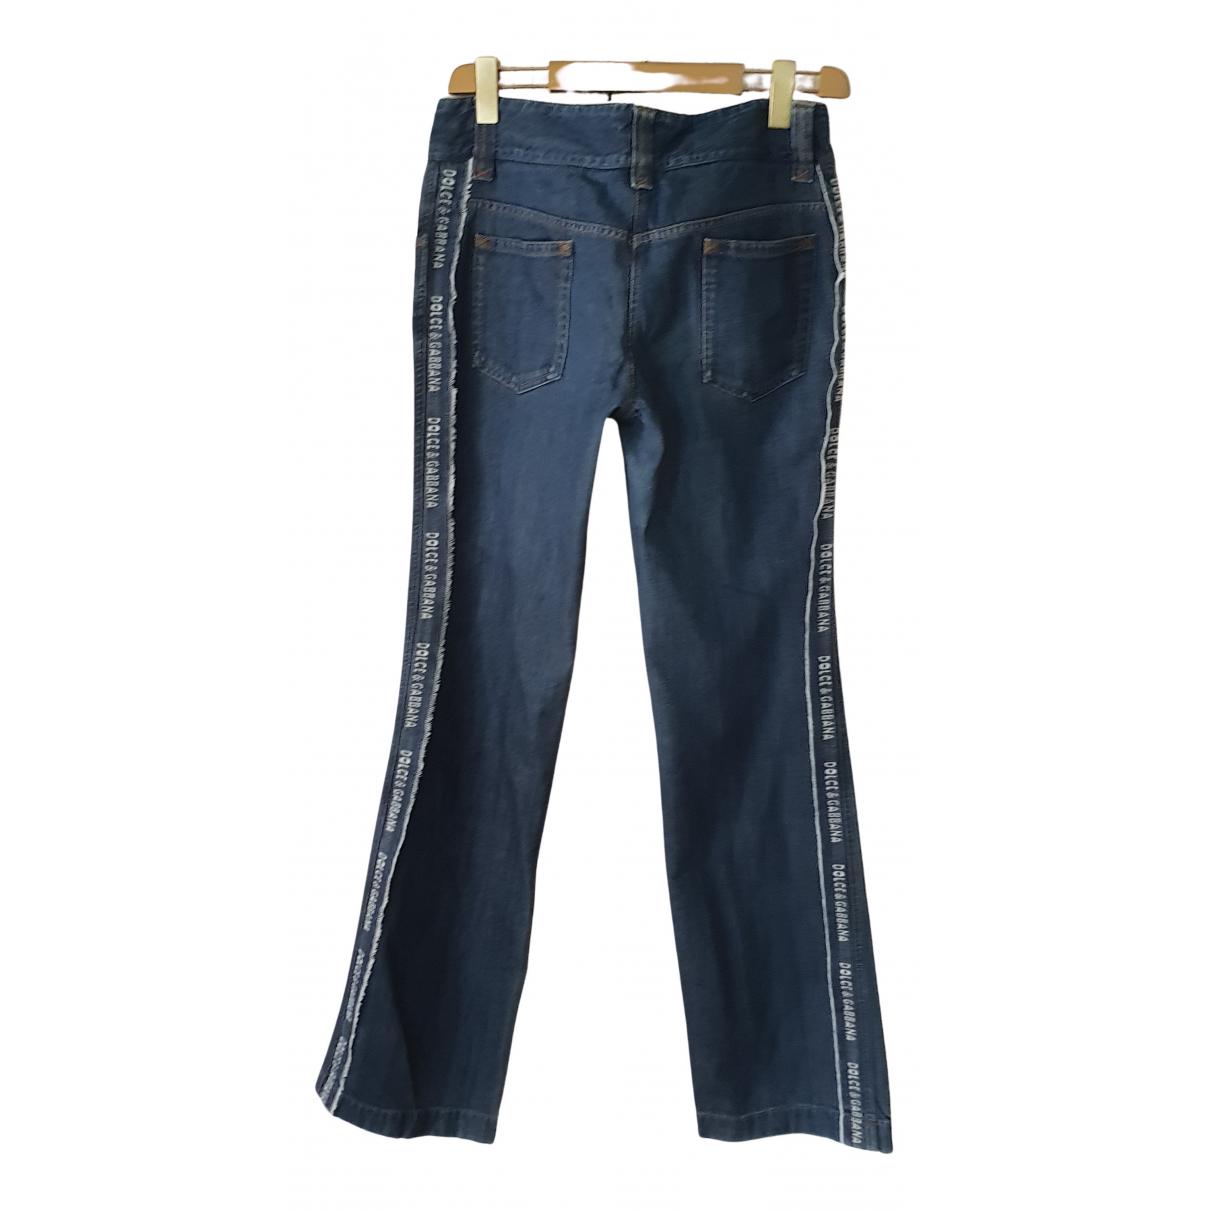 Dolce & Gabbana N Blue Cotton Jeans for Women 31 US